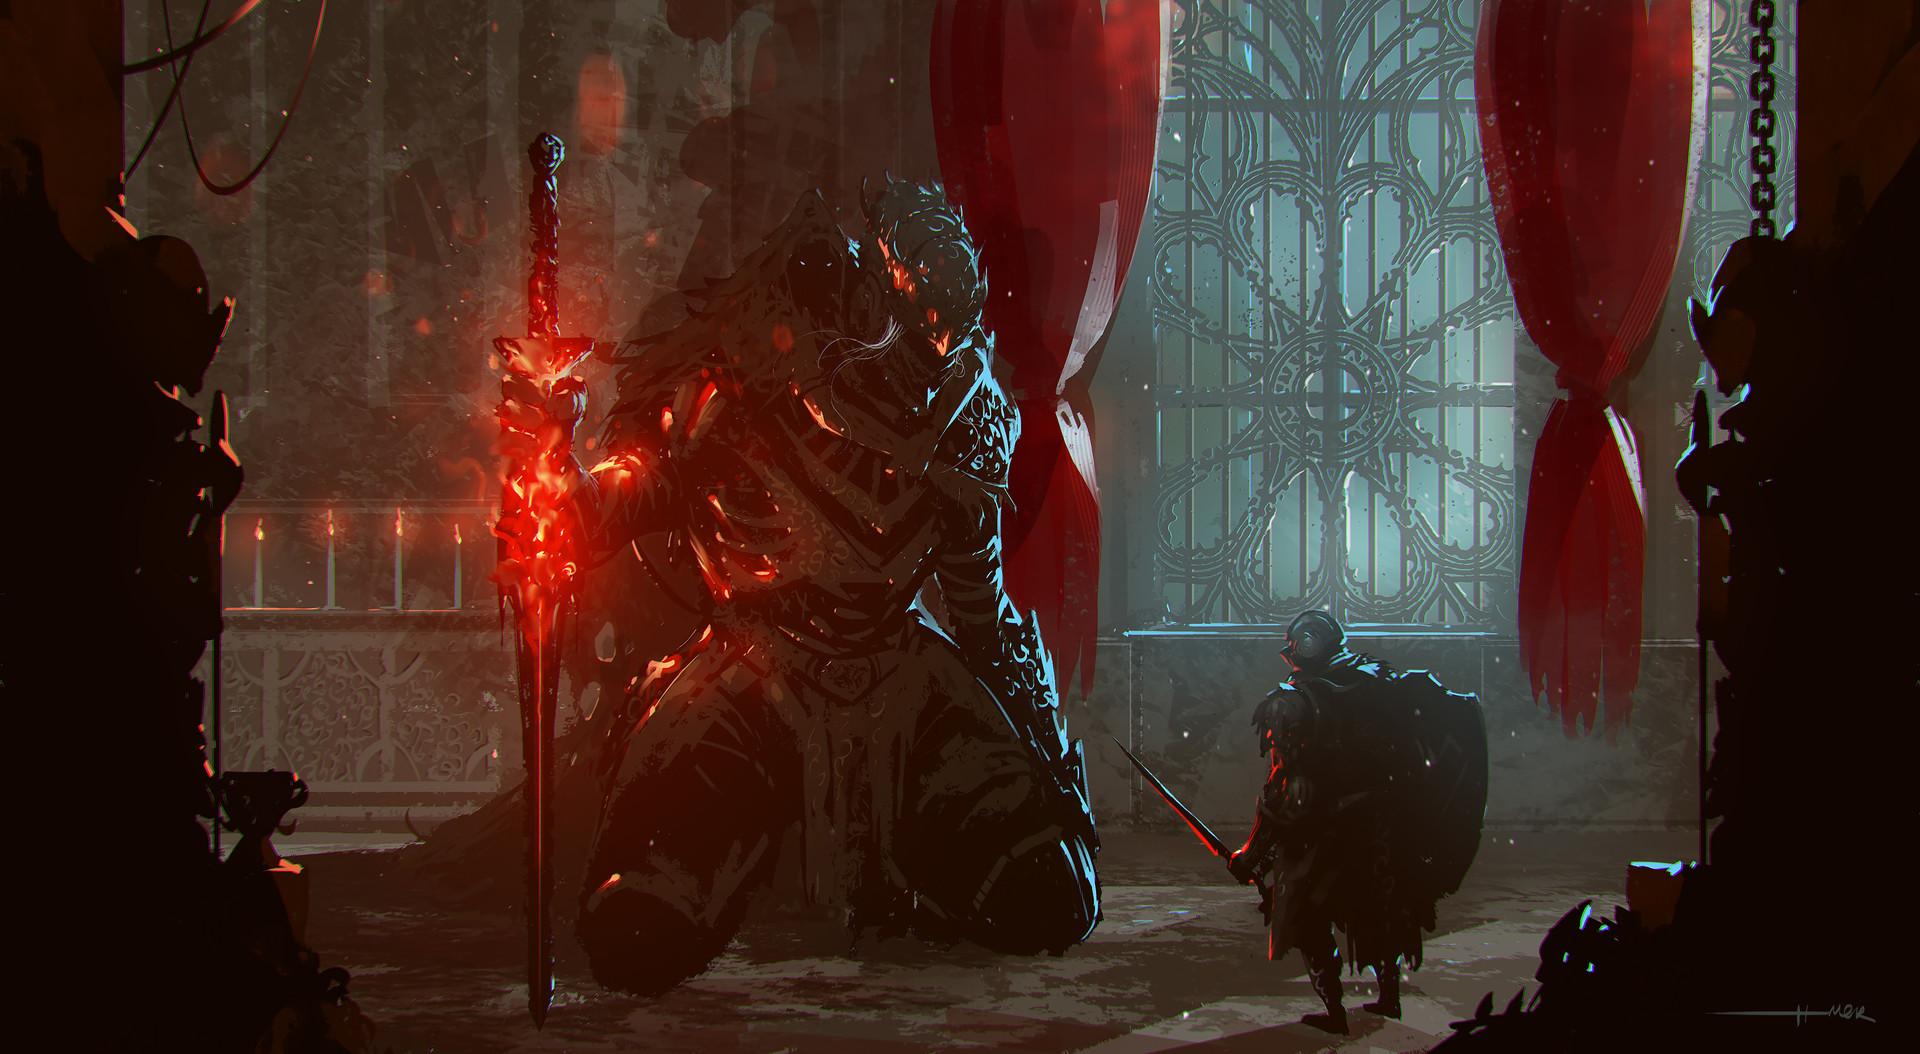 Artwork Dark Souls Ii Wallpaper: This Artwork Of Dark Souls III's Best Boss Fight Is Killer